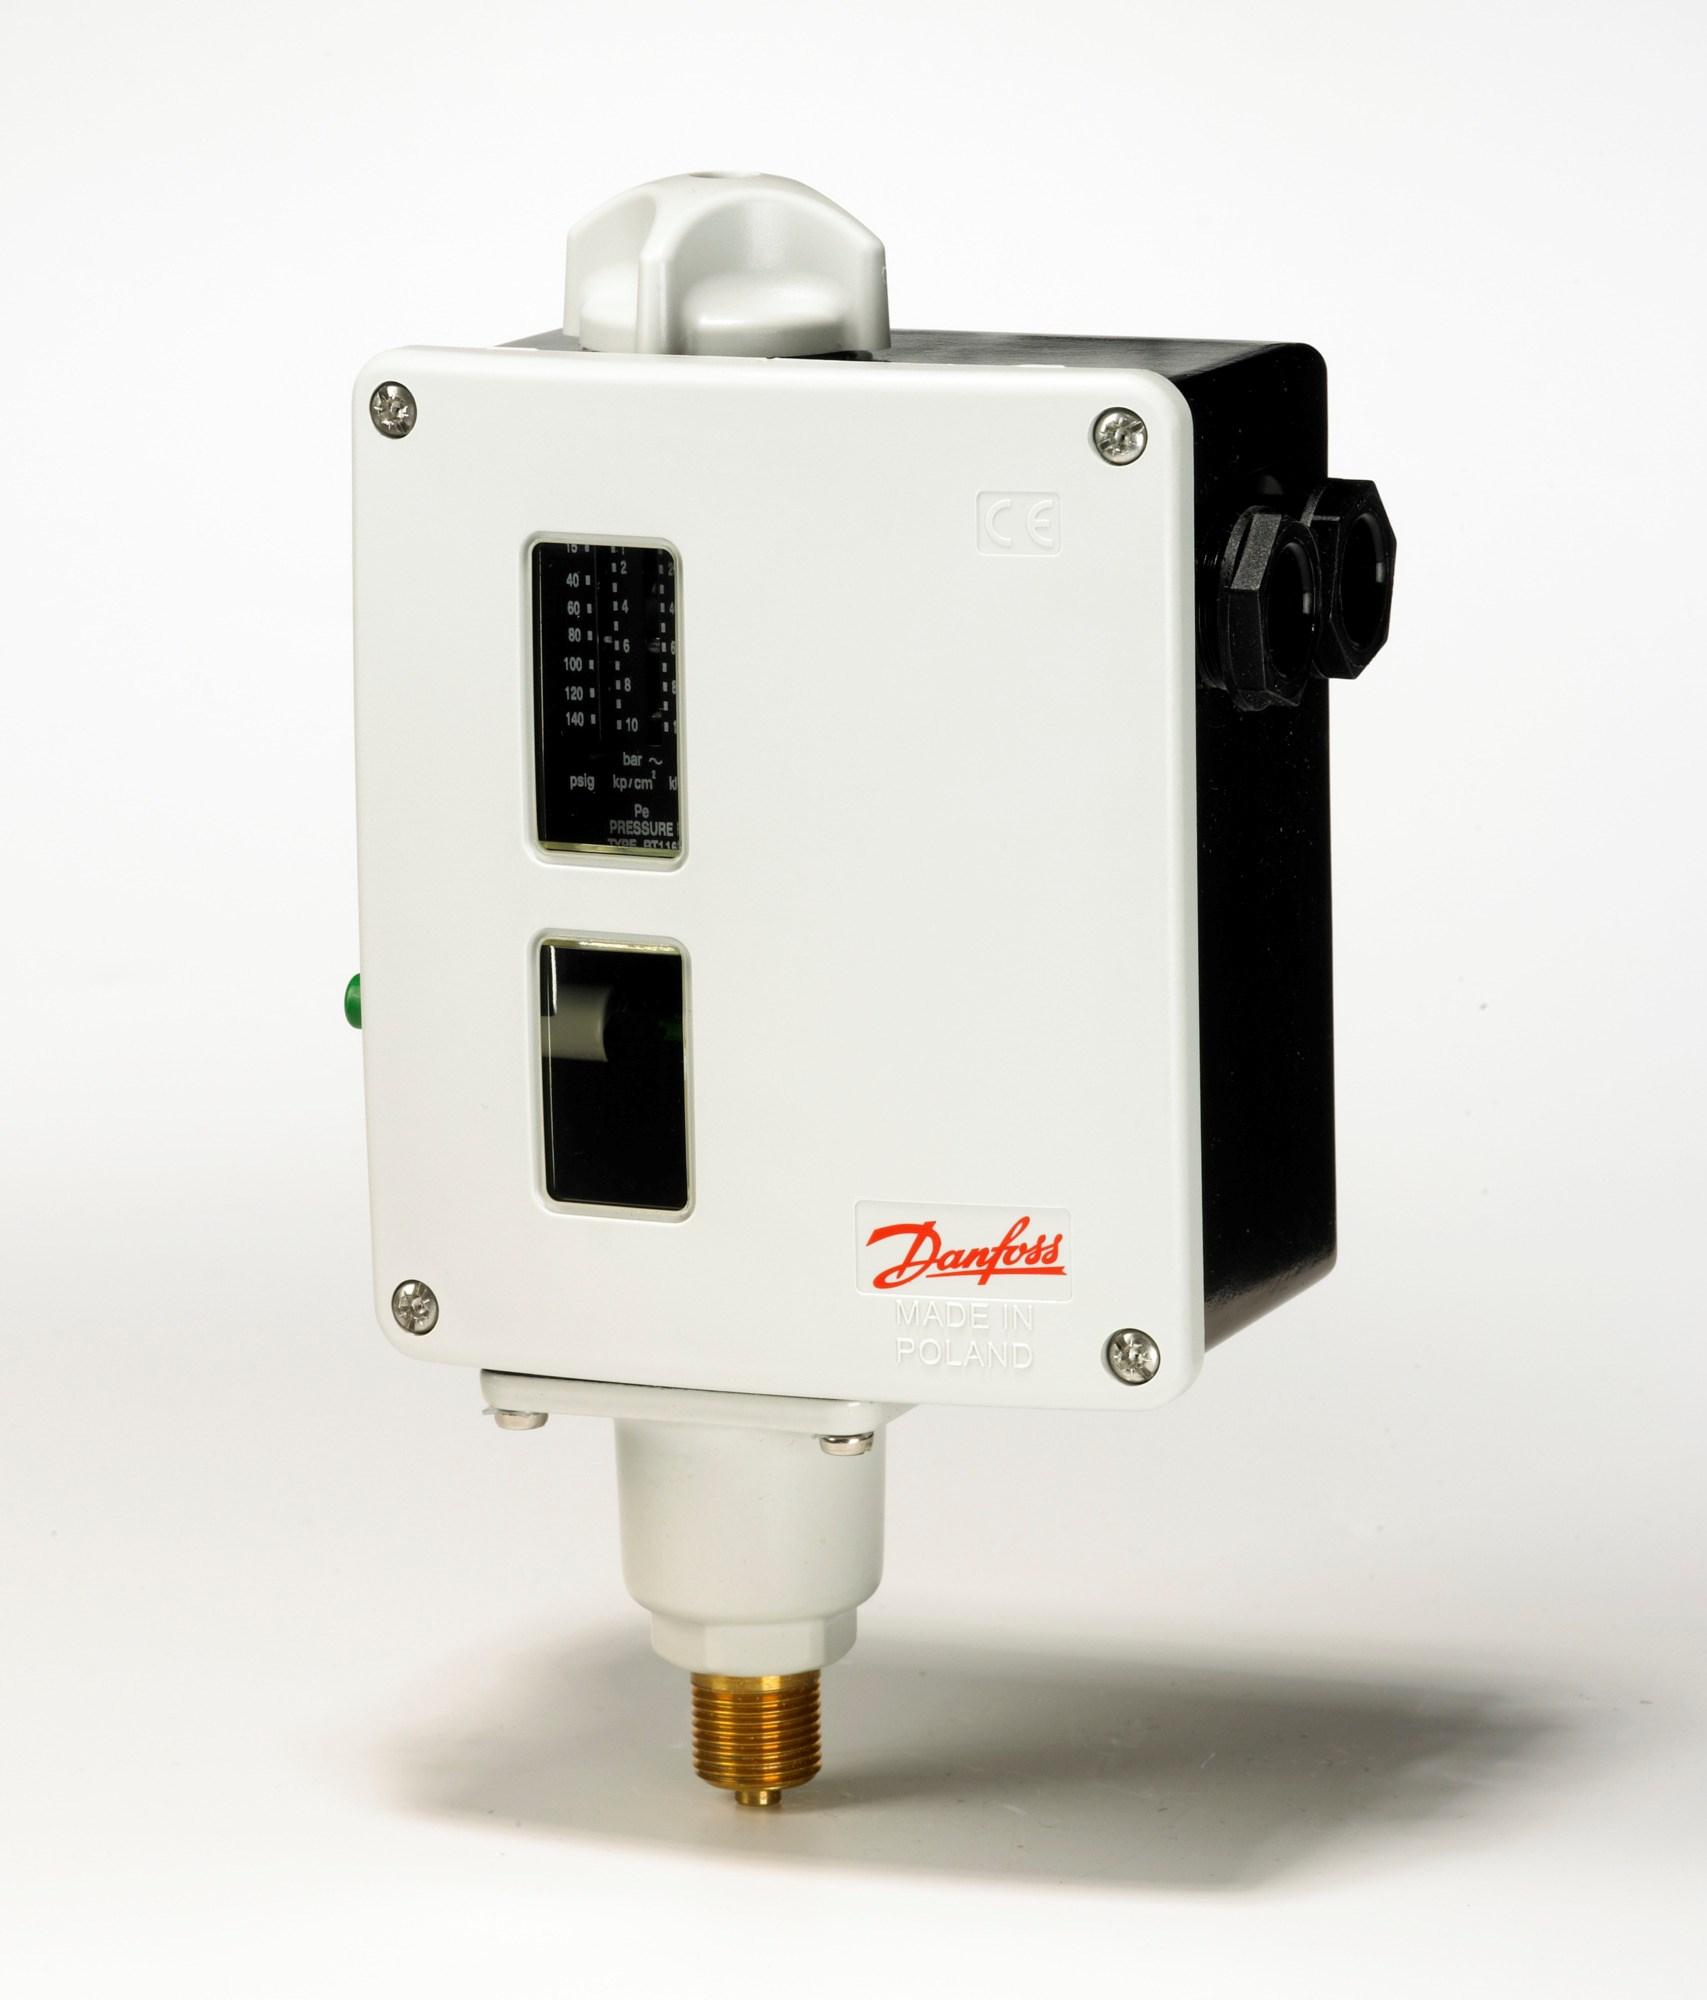 031E021566 Module presostat pression 26 Bar Type de sorties 3PST-NC DANFOSS